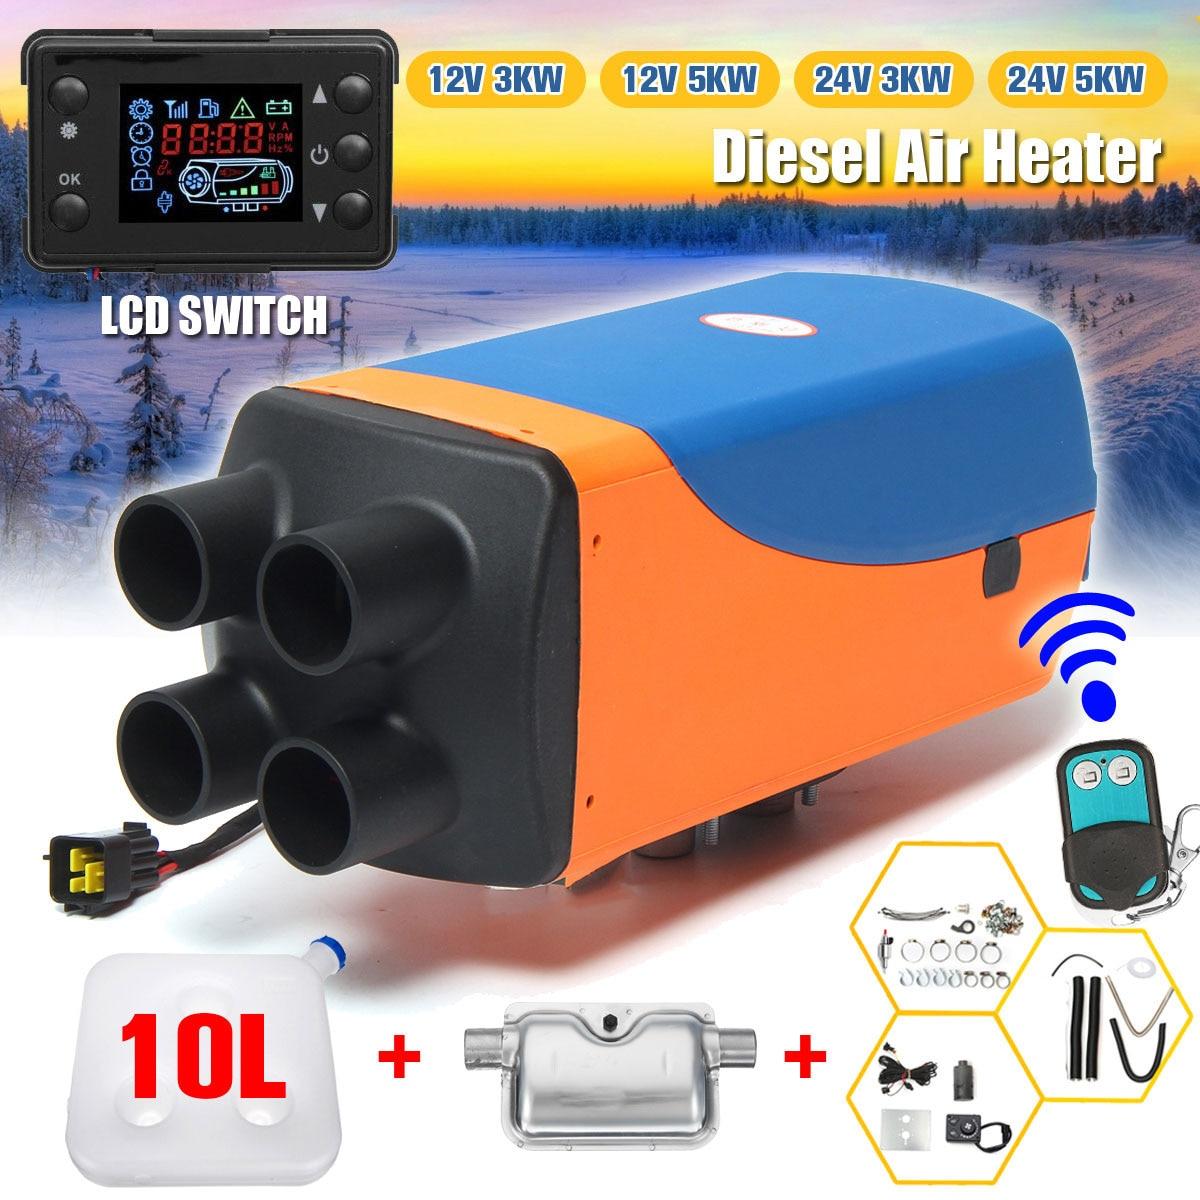 12 v/24 v 3kw/5kw diesels aquecedor de ar do carro aquecedor de estacionamento diesels aquecedor de ar com controle remoto display lcd para reboque motorhome